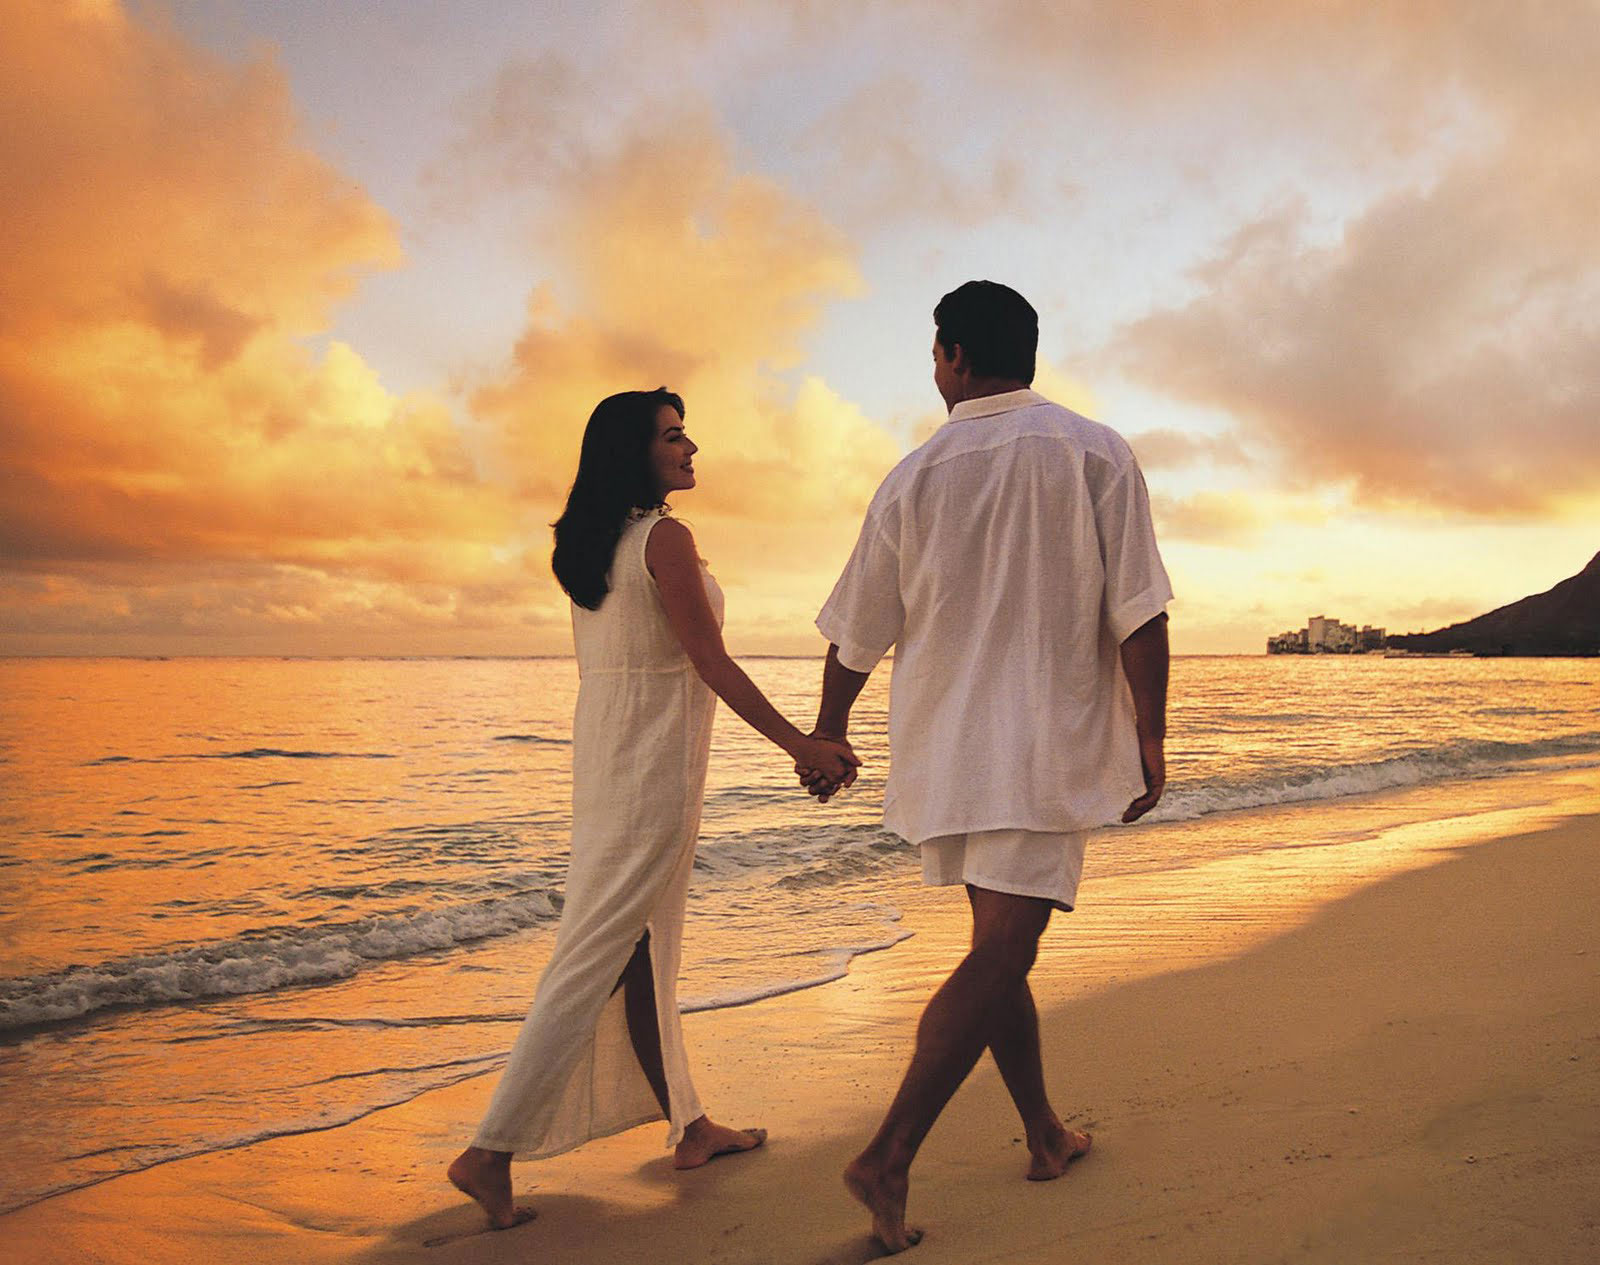 Love Couple 10798 - Love Couple - True Love Wallpaper HD